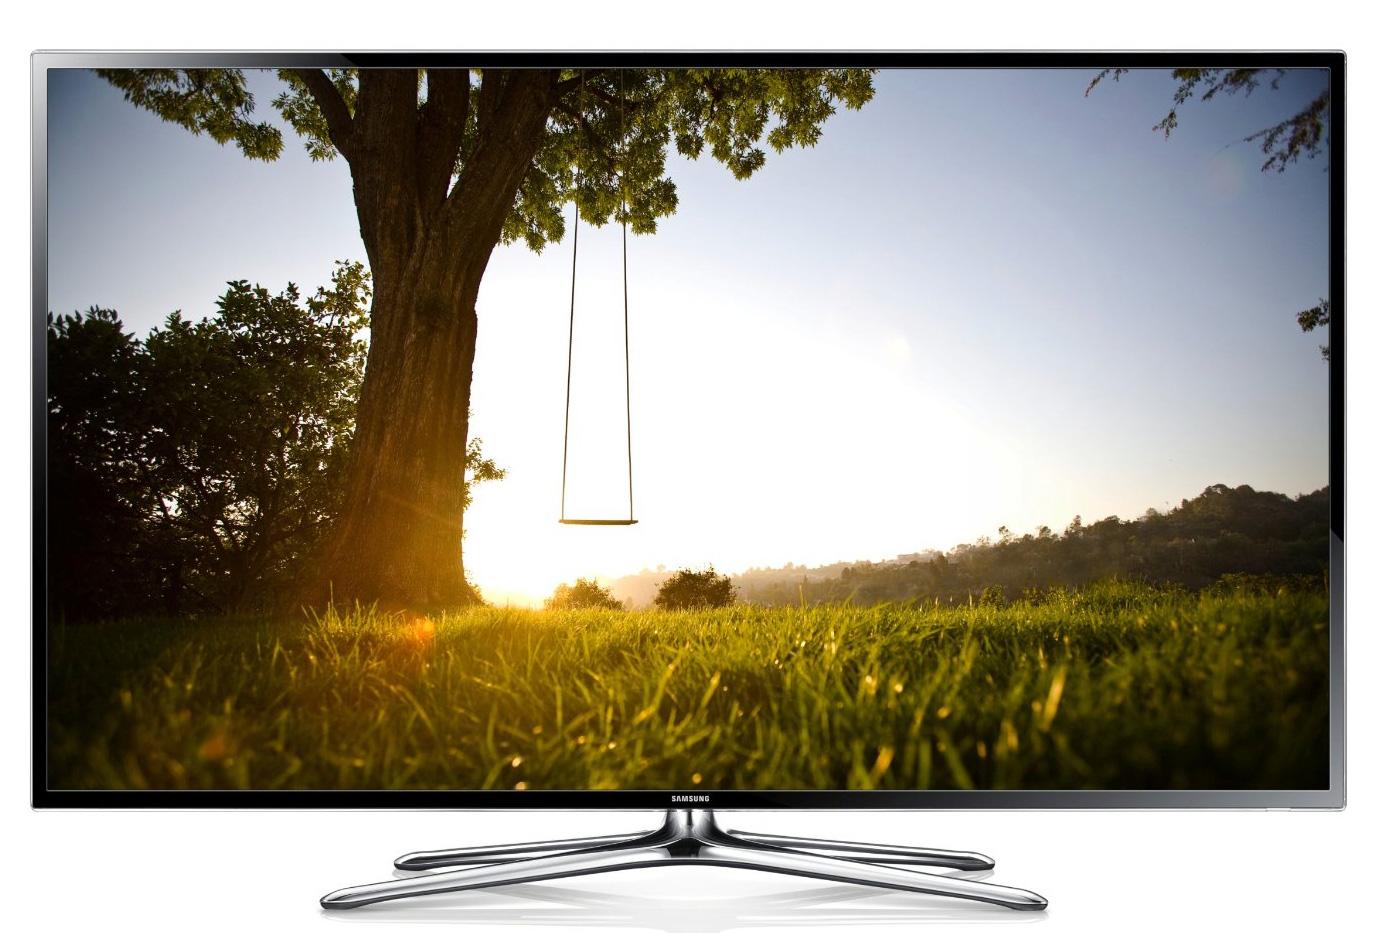 Samsung Fernseher 40 Zoll